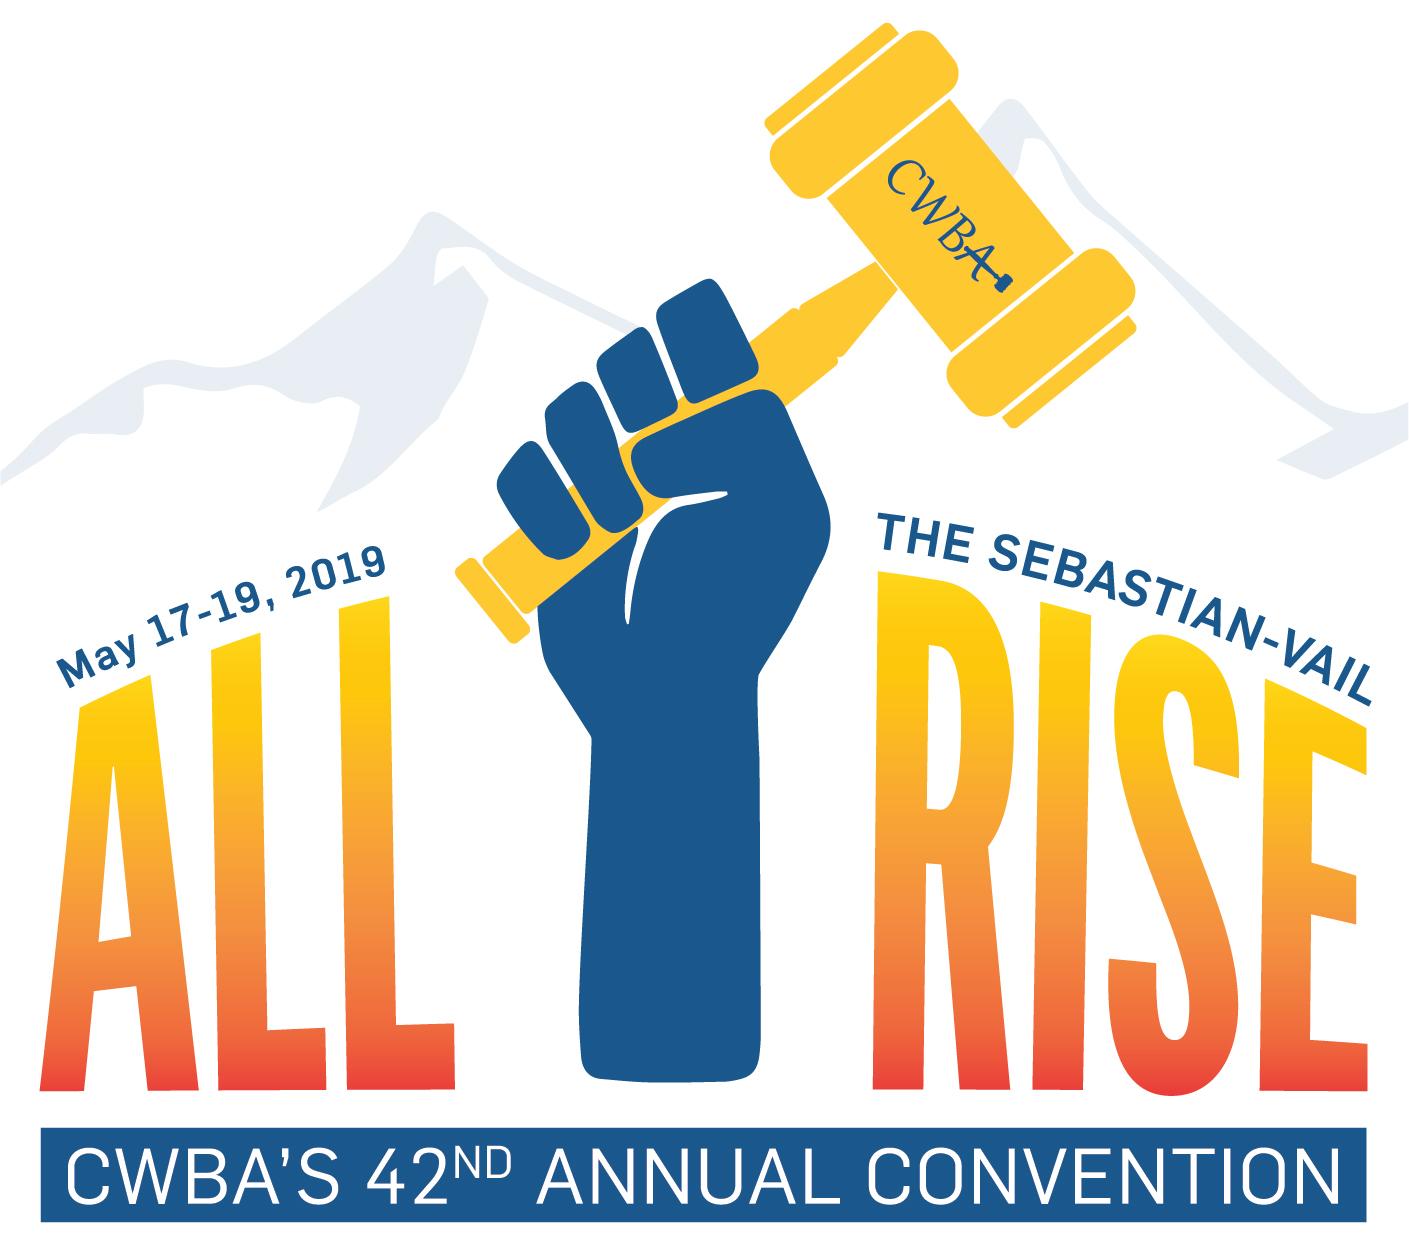 Colorado Women's Bar Association 42nd Annual Convention LOGO